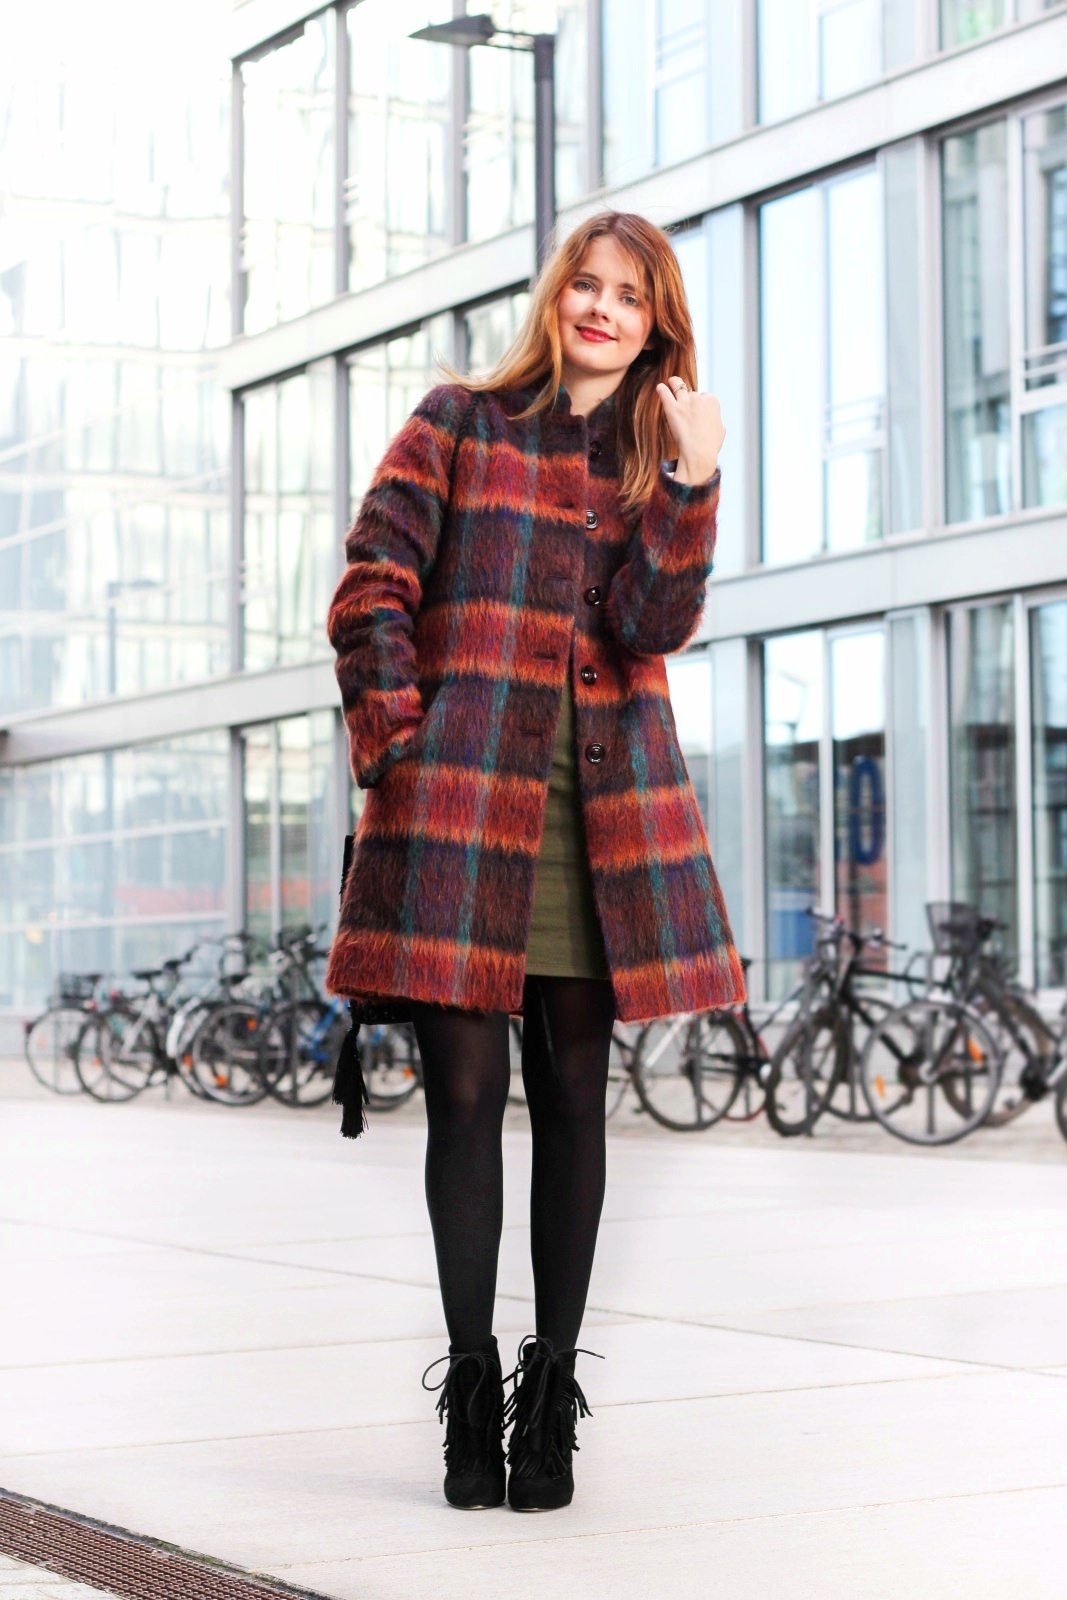 desbelleschoses-fashion-blog-köln-outfit-basickleid-und-fransenheels-cinque-mantel-bullboxer-high-heels 1